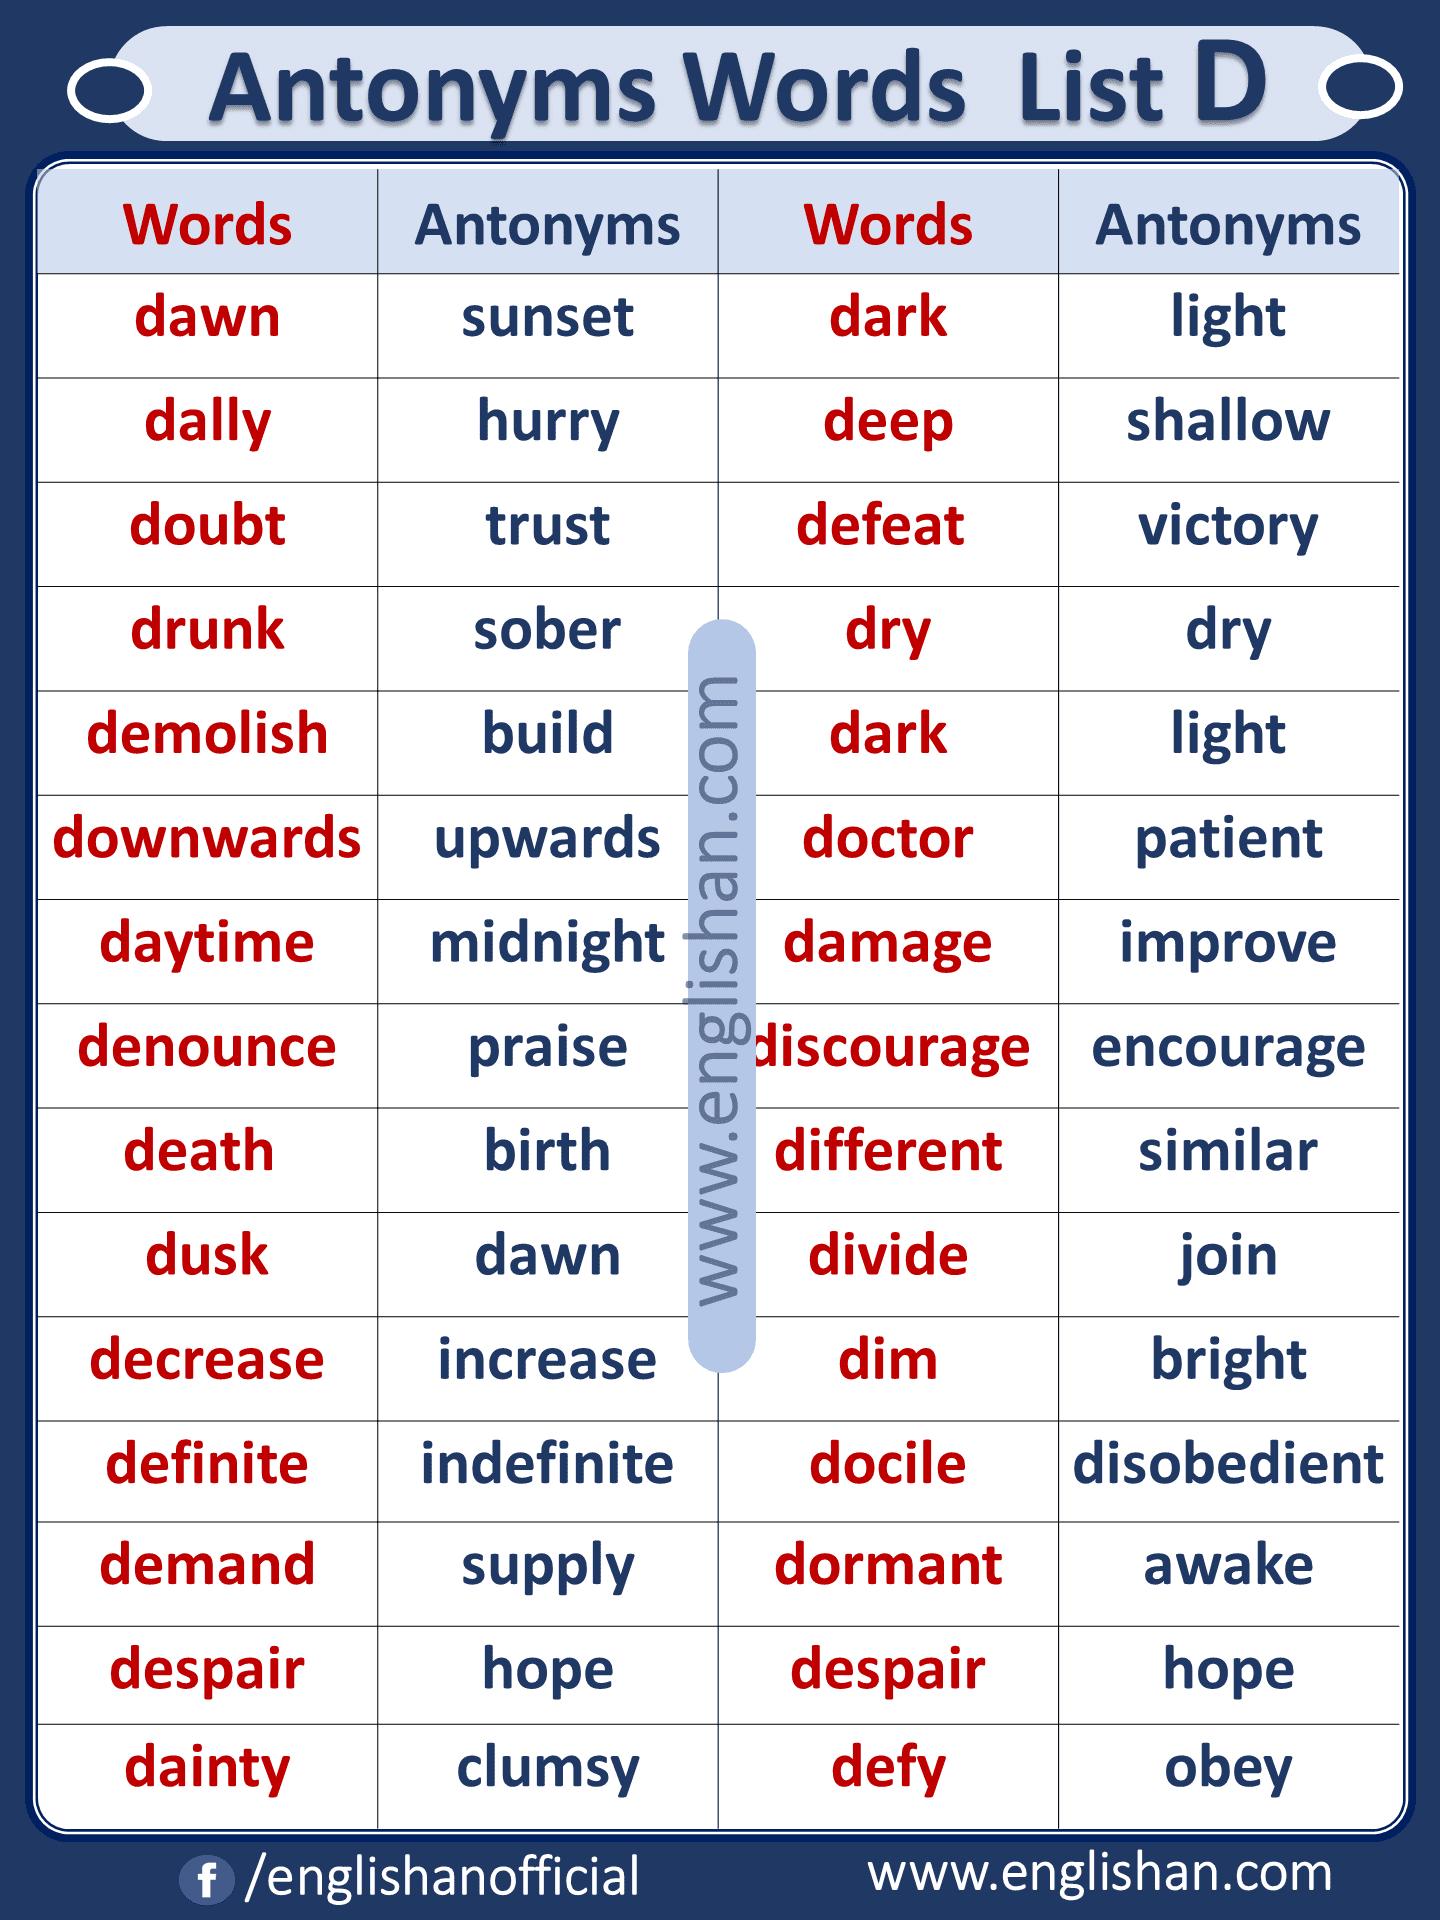 Antonym Words List D